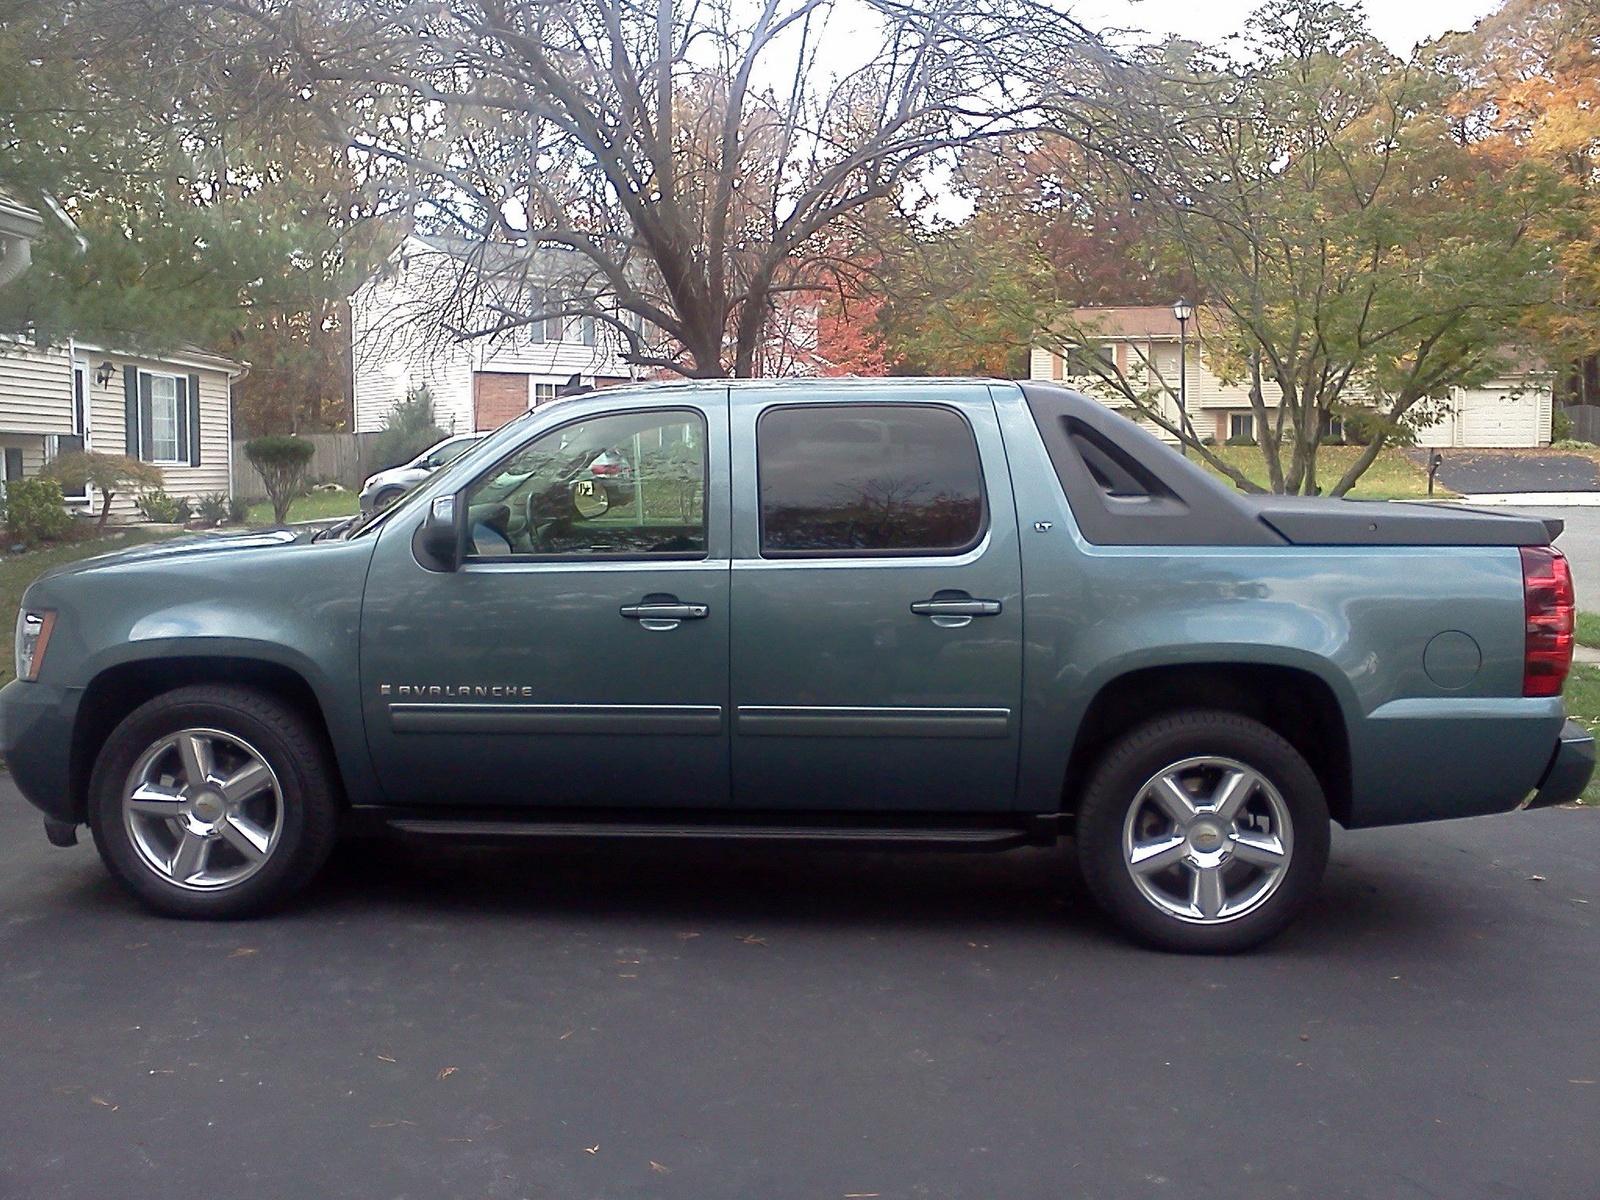 2009 Chevrolet Avalanche - Pictures - CarGurus